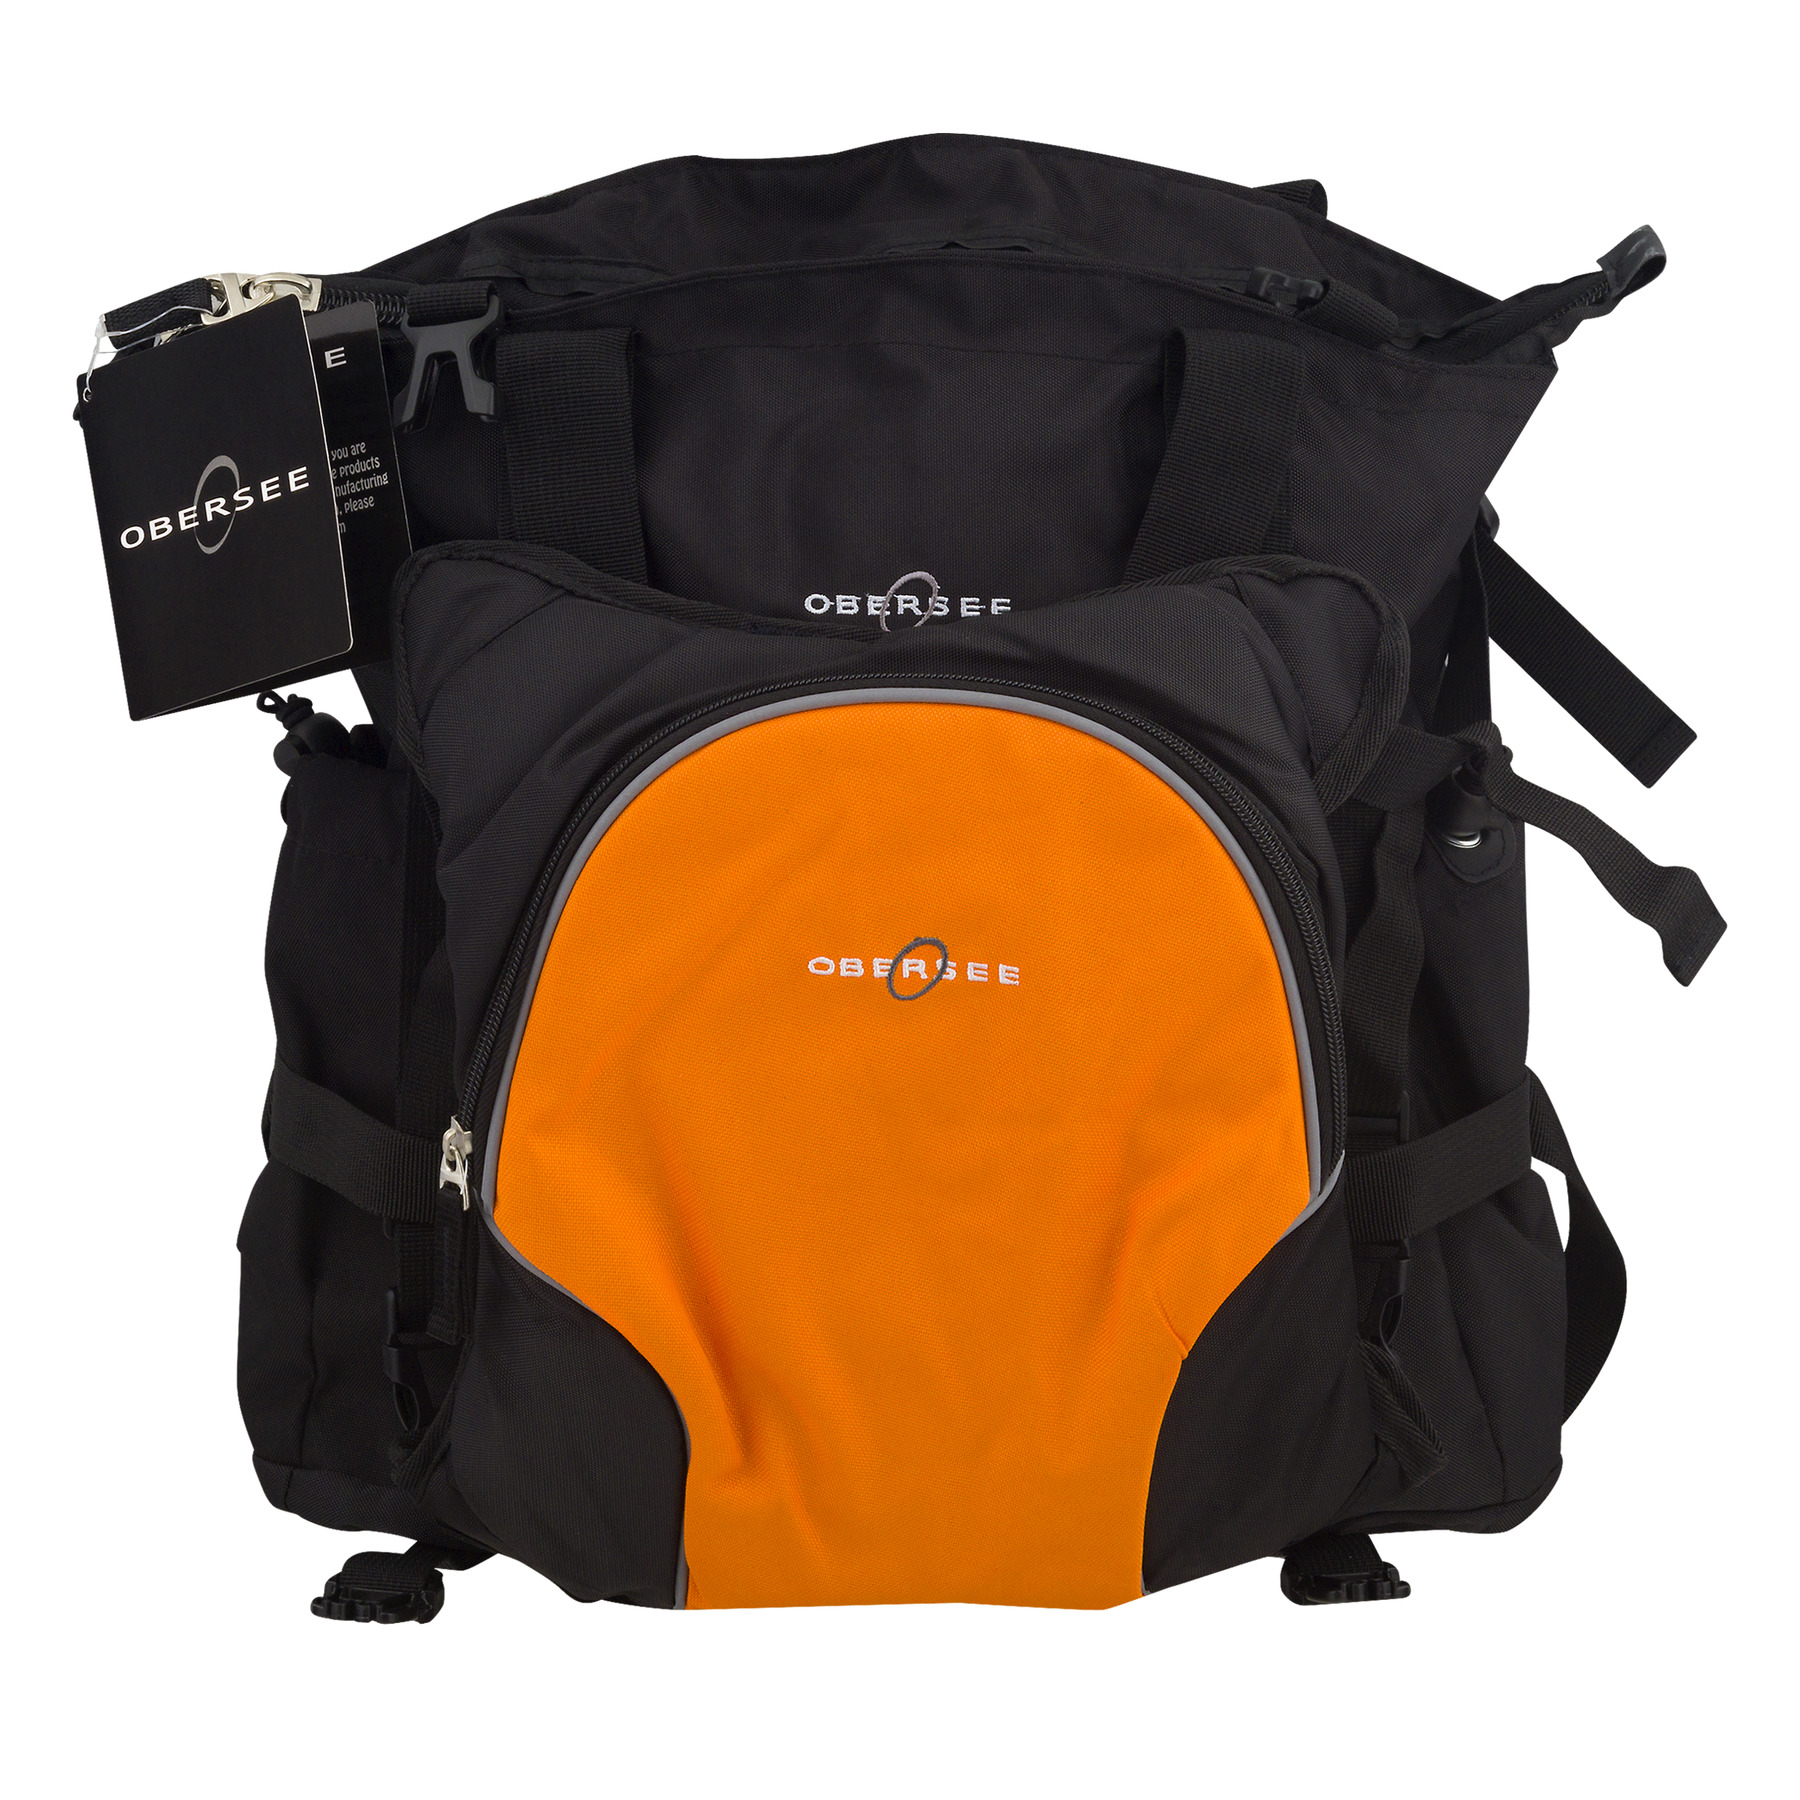 Obersee Innsbruck Diaper Bag Tote With Cooler Black/Orange, 3.0 CT